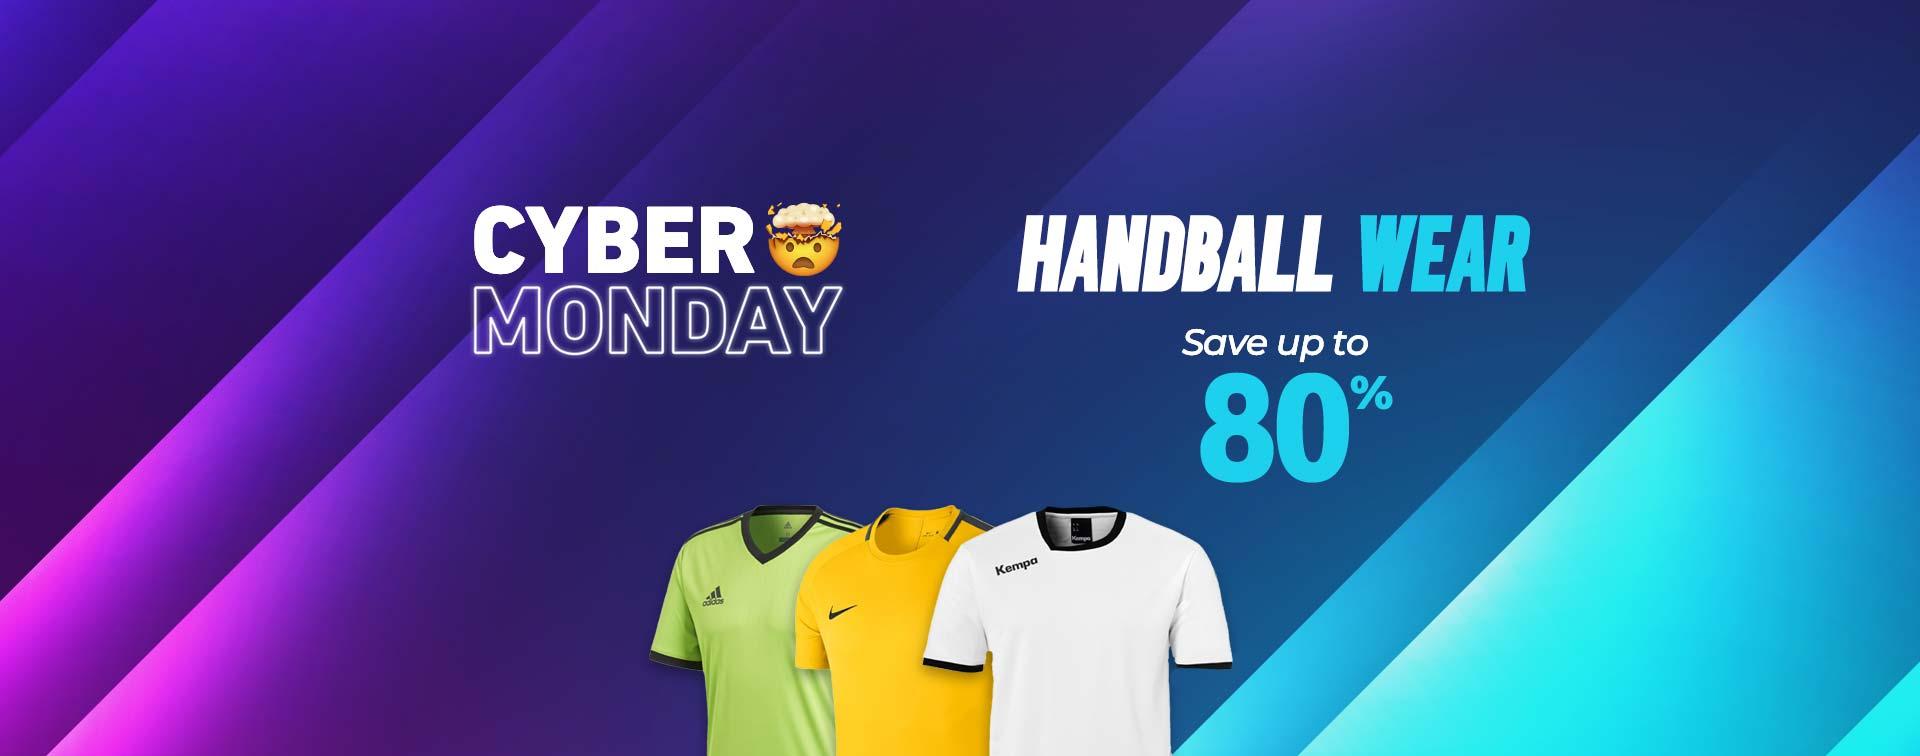 Cyber Monday handball wear